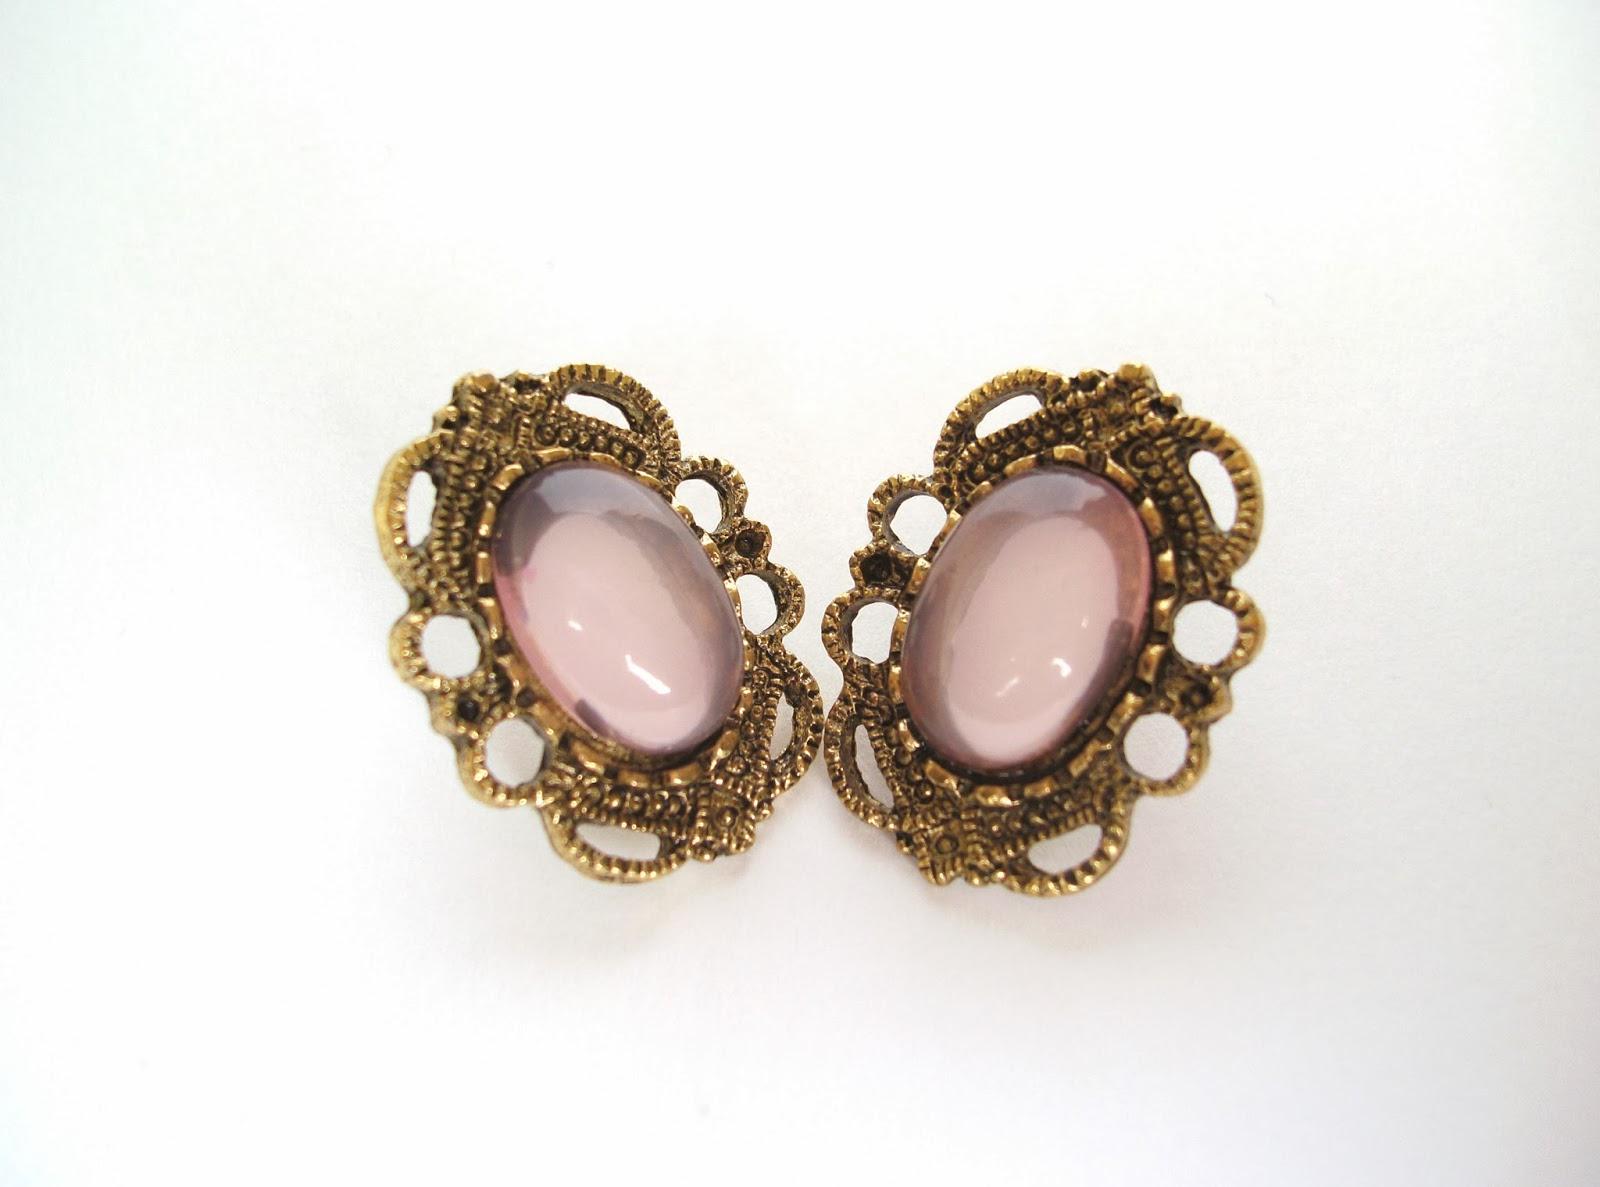 Western Retro Style Hollow out Rhinestone Earrings $1.47